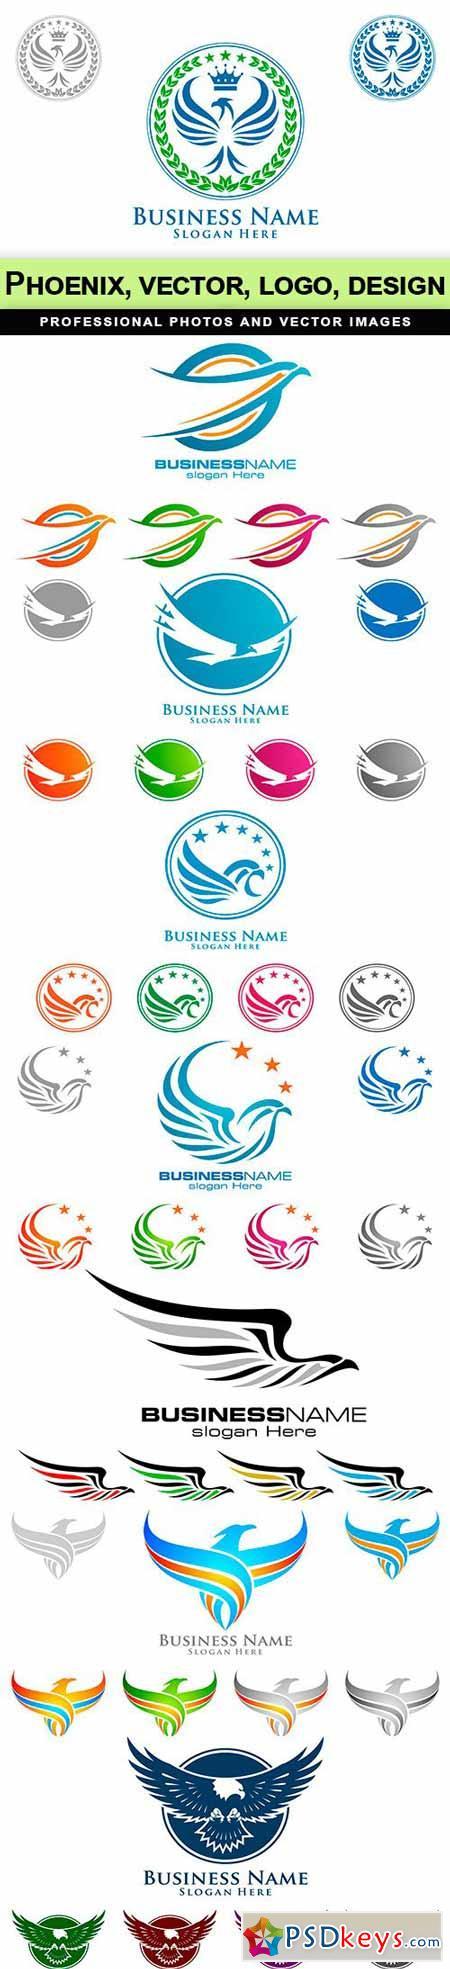 Phoenix, vector, logo, design - 8 EPS